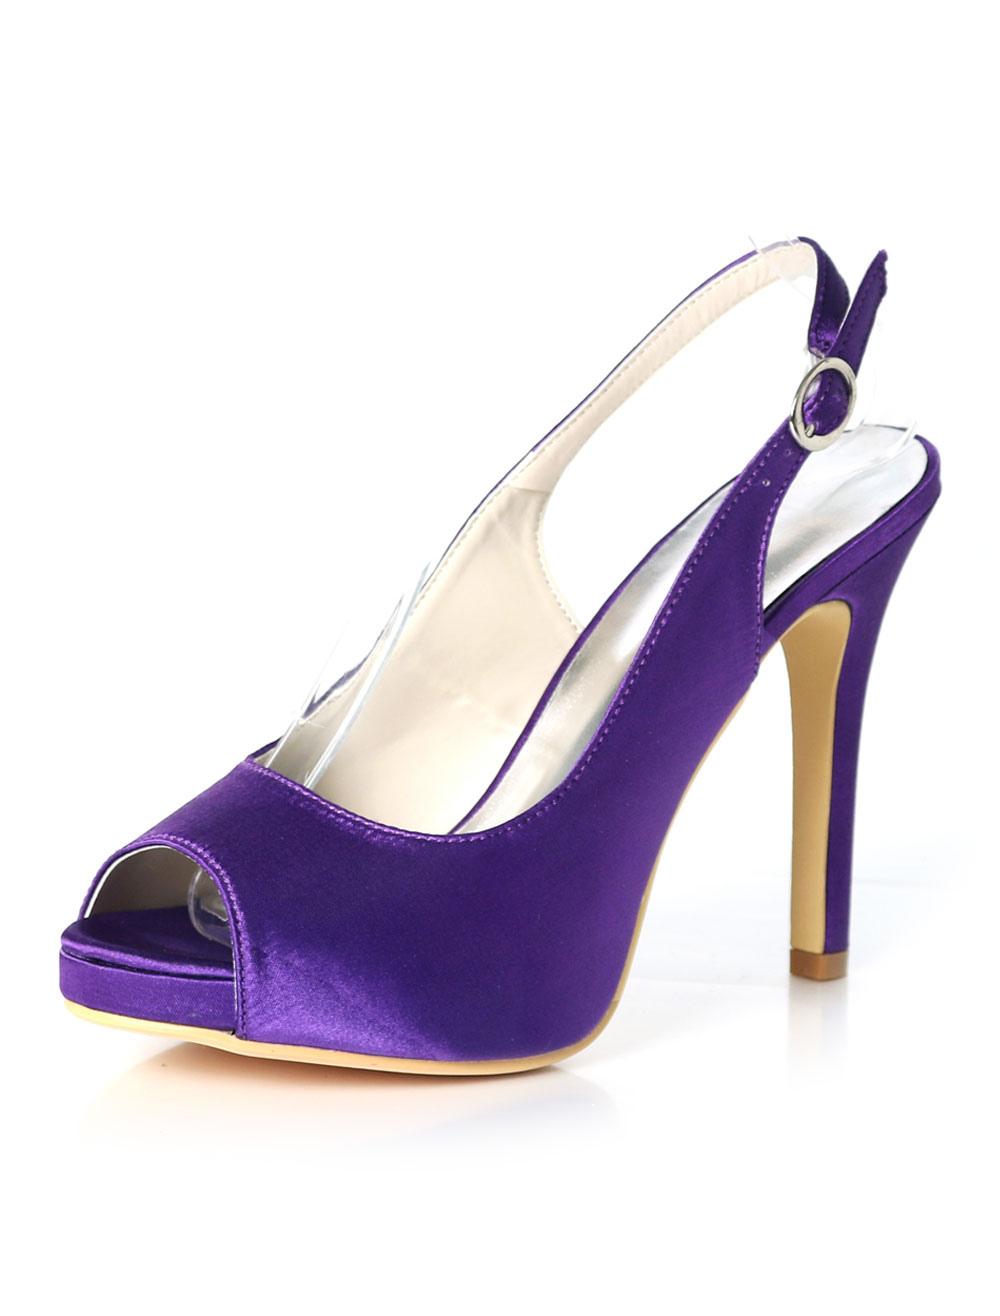 c9bdae54cd973 ... Purple Mother Shoes Satin Peep Toe Slingbacks Wedding Shoes High Heel  Wedding Guest Shoes-No. 12. 40%OFF. Color:deep purple